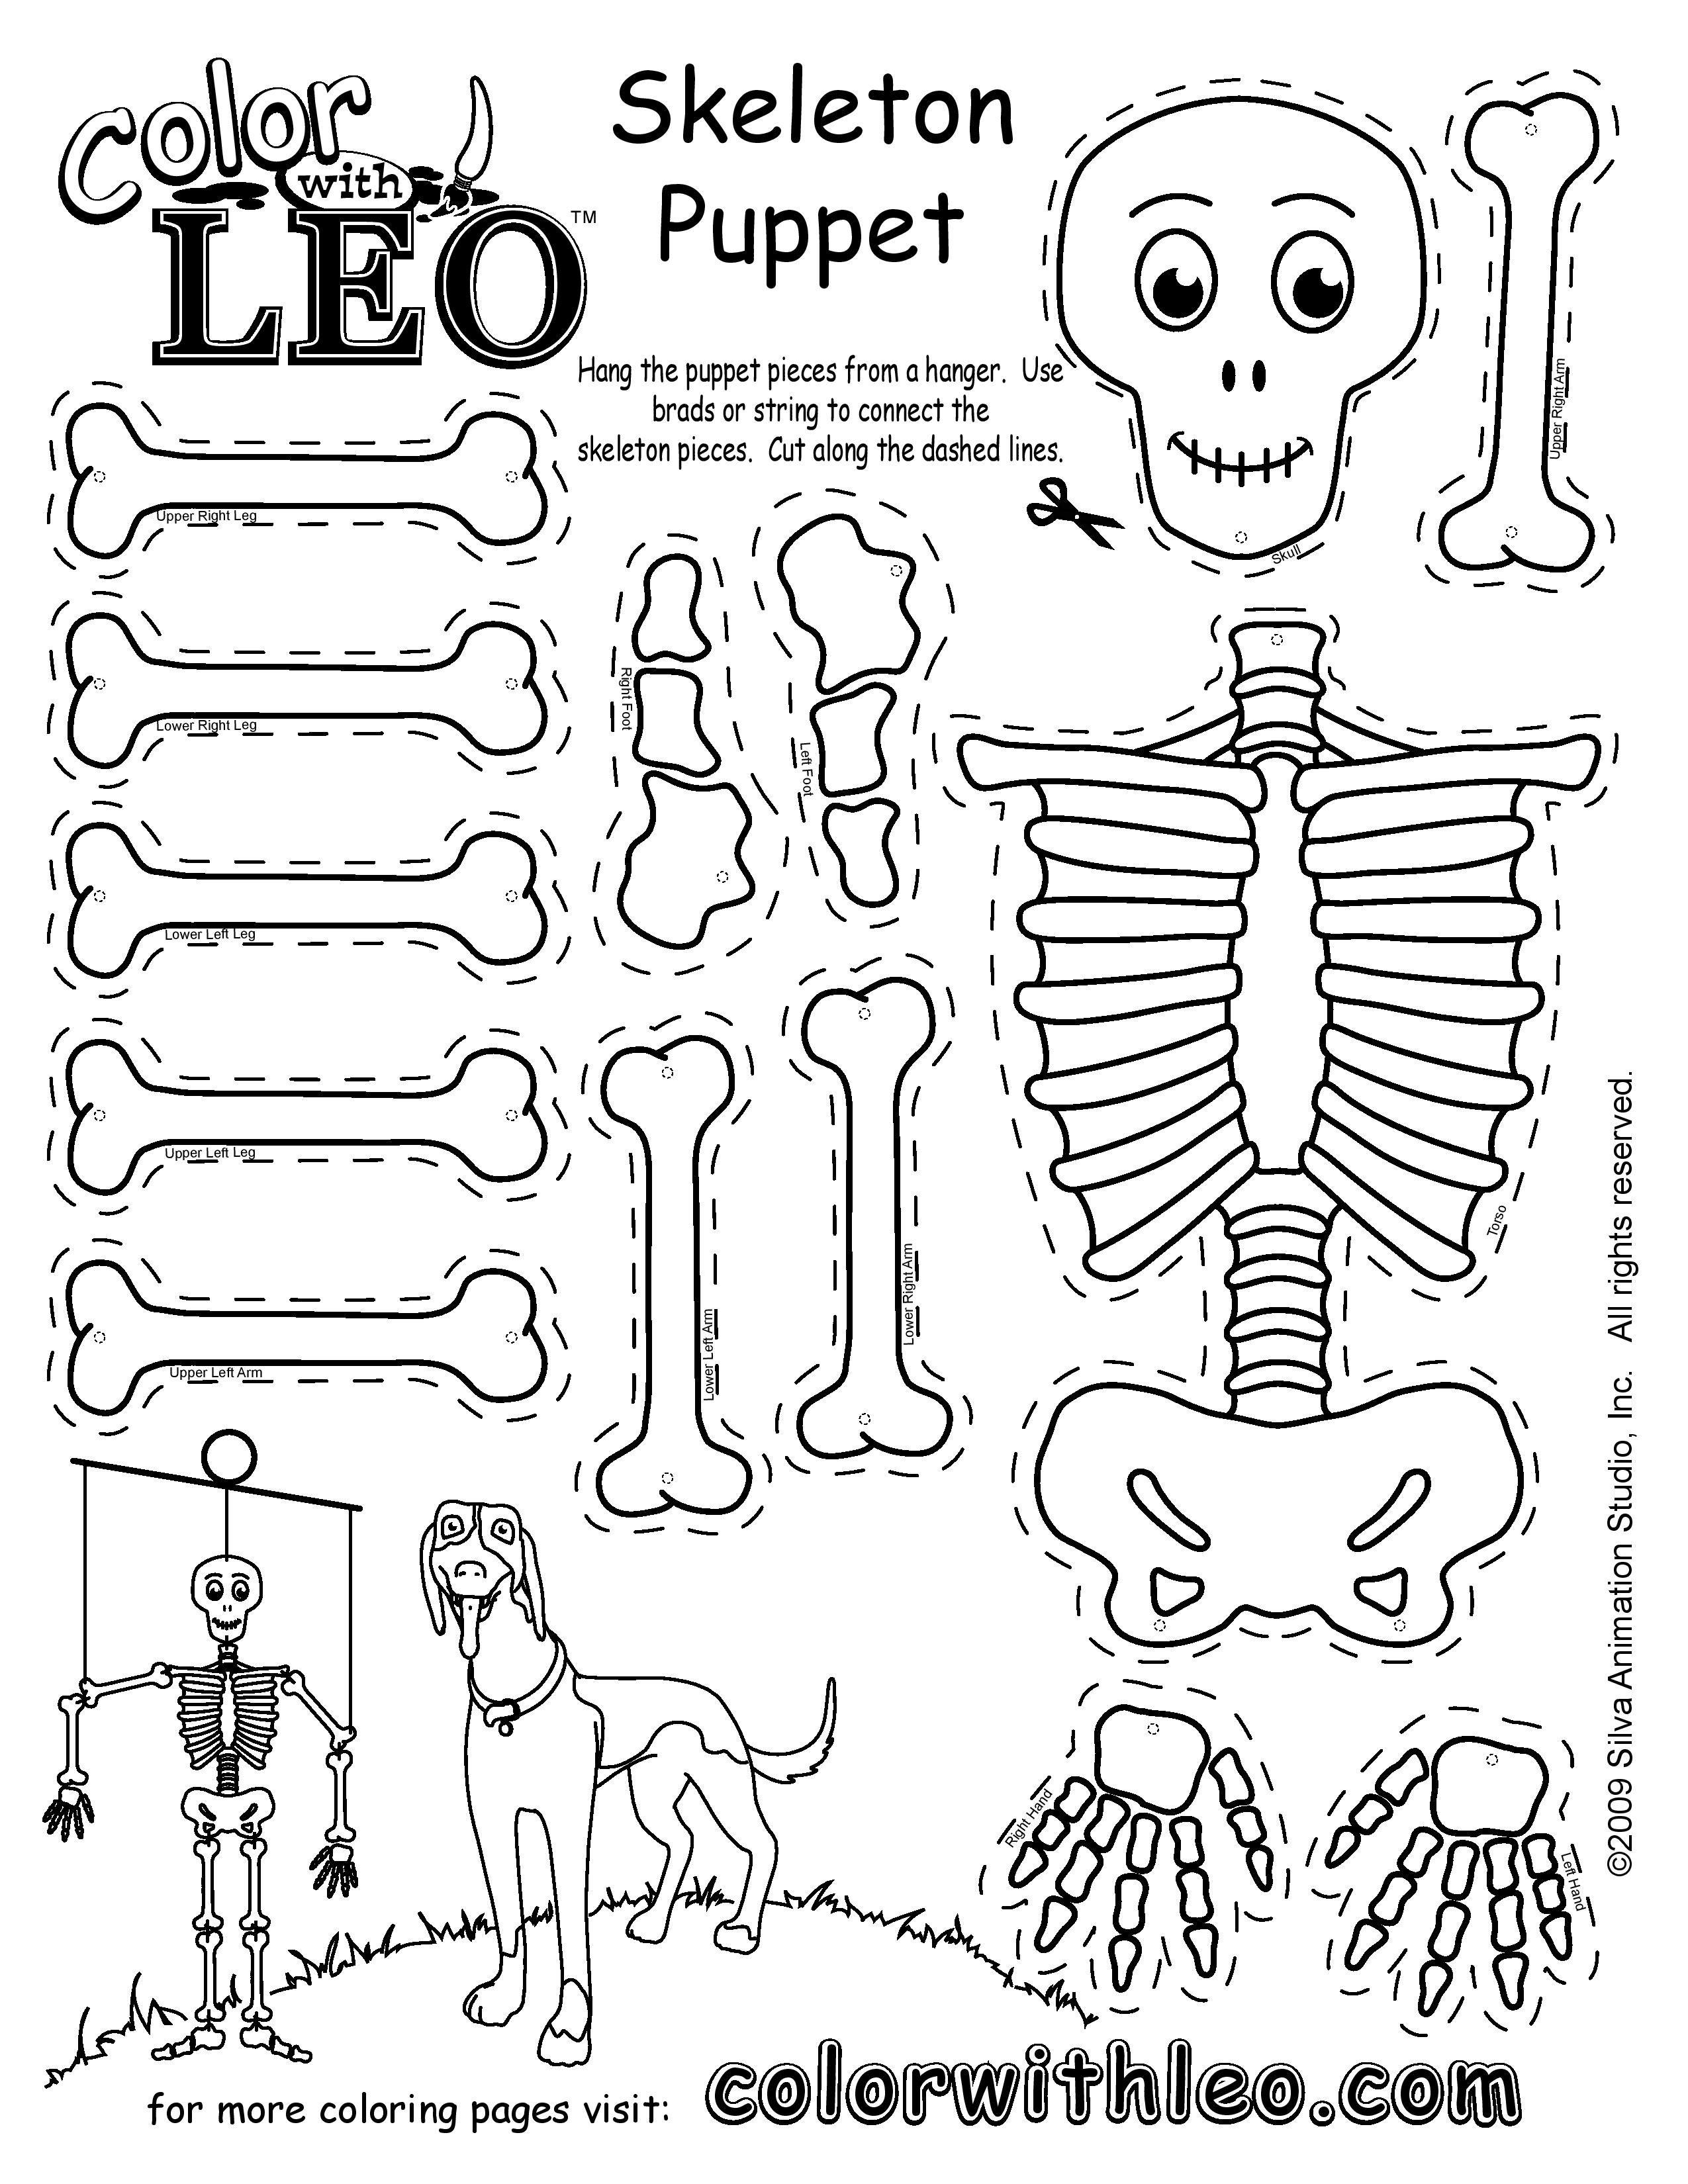 Skeleton Puppet Skeleton Craft Skeleton Puppet Puppet Crafts [ 3300 x 2550 Pixel ]